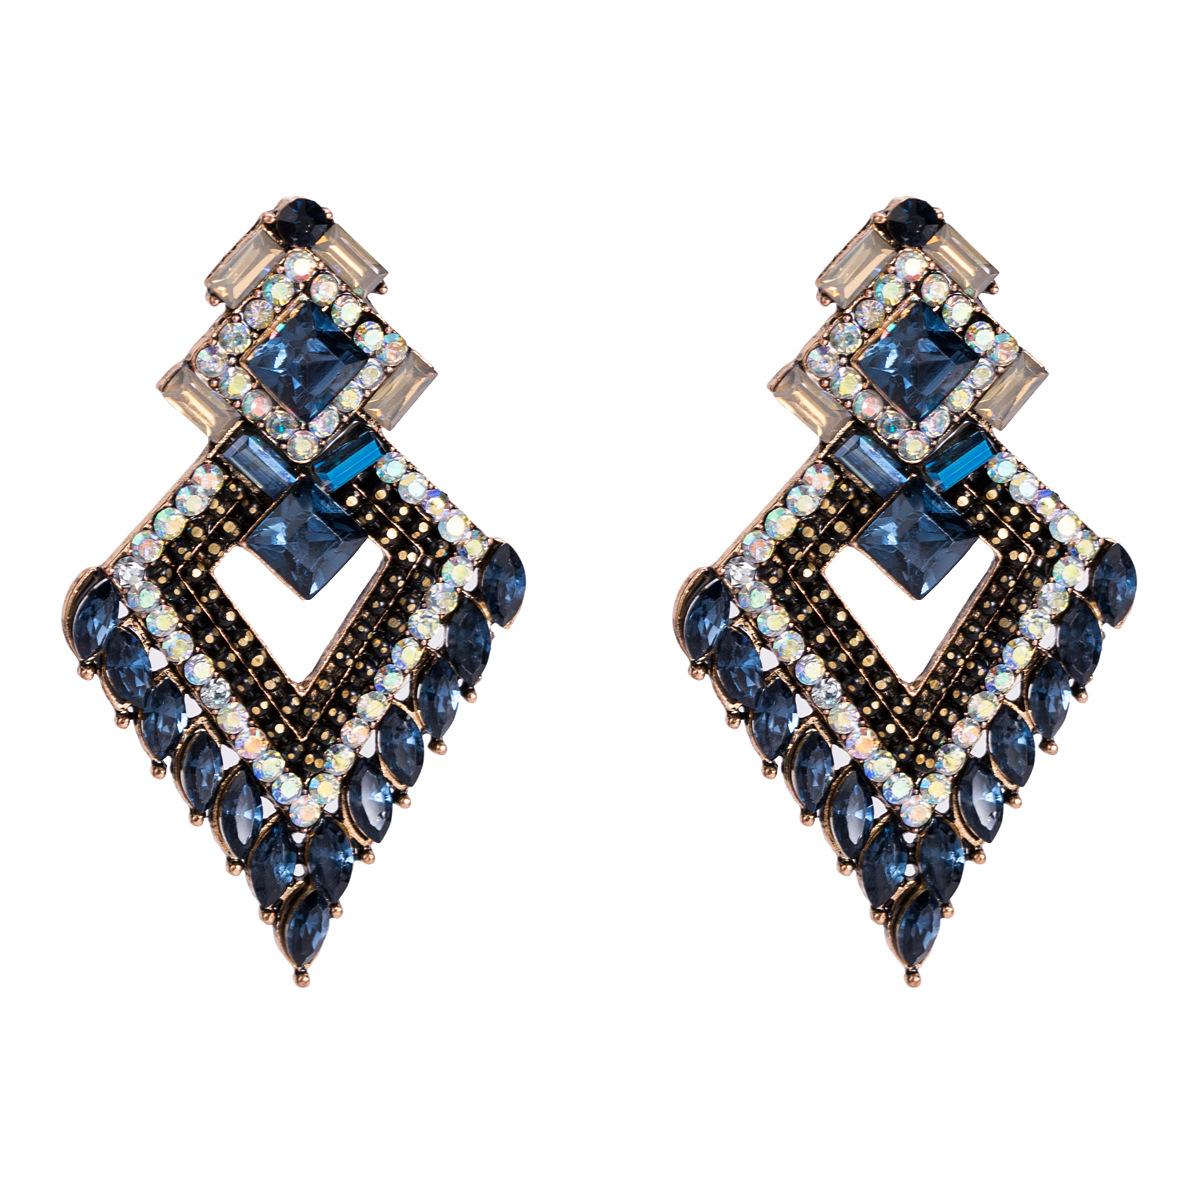 Alloy Fashion Geometric earring  (Alloy) NHJE1508-Alloy